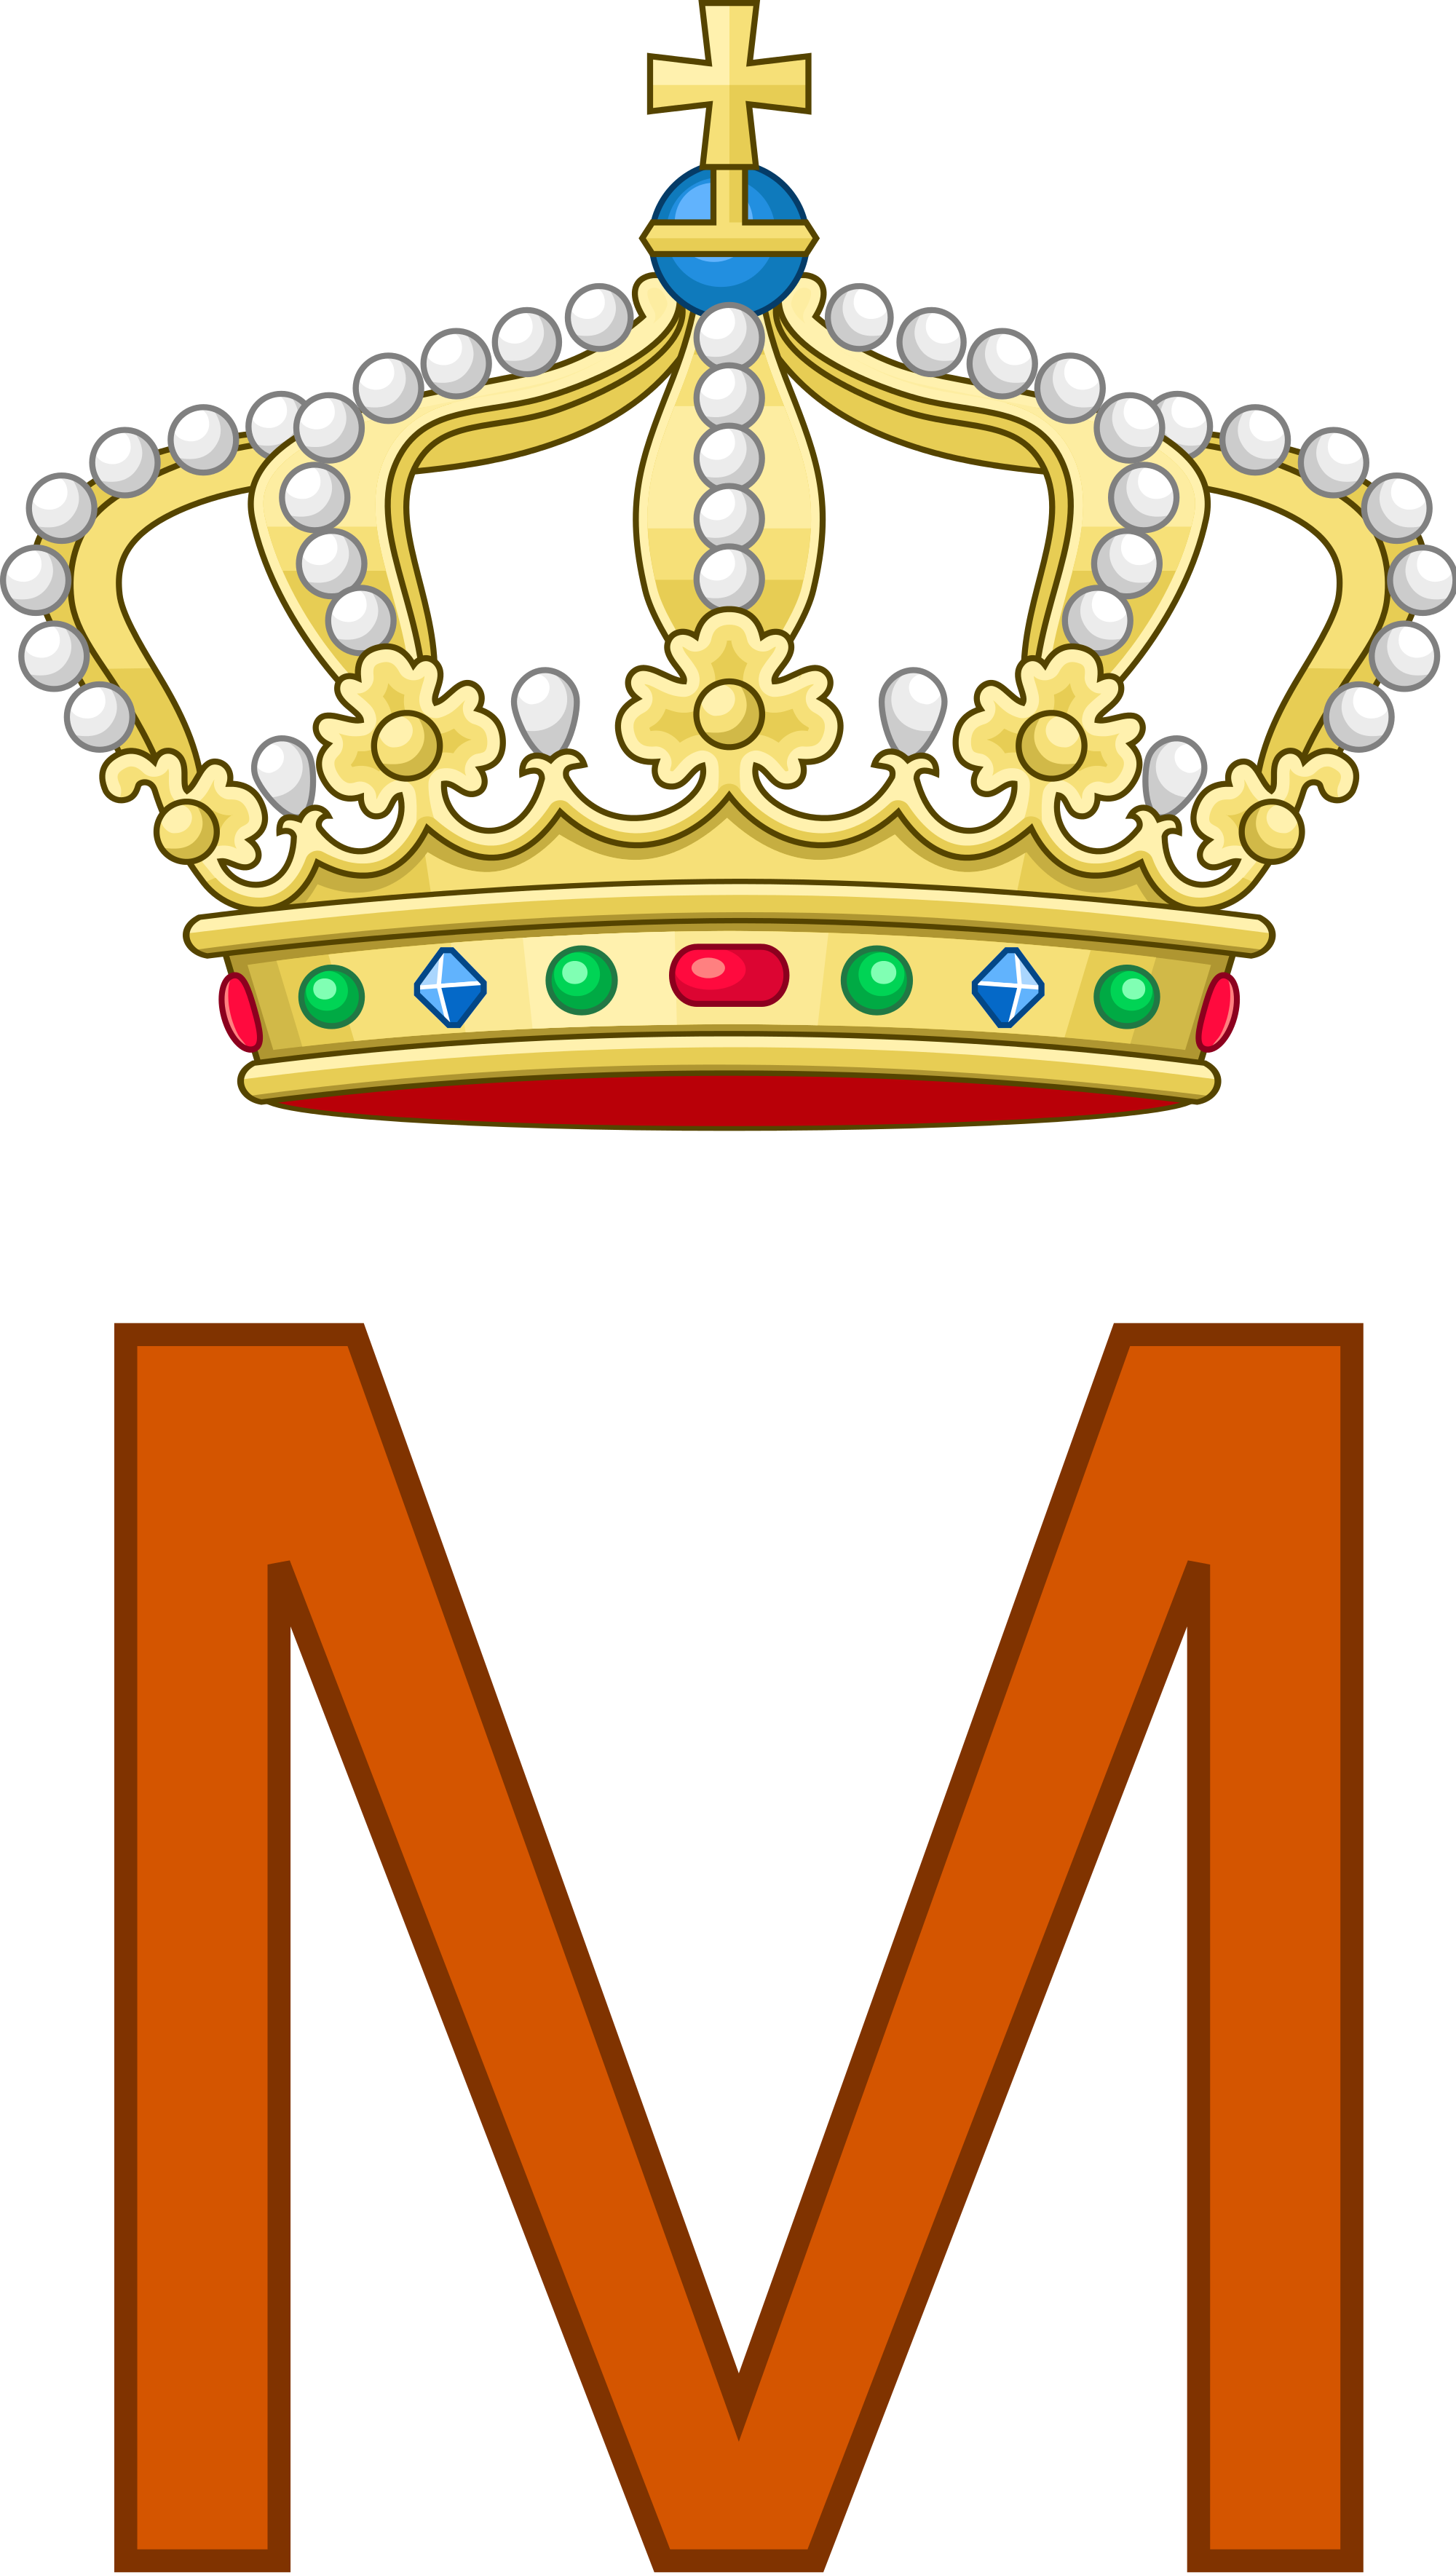 File:Royal Monogram of Princess Maxima of the Netherlands.svg.